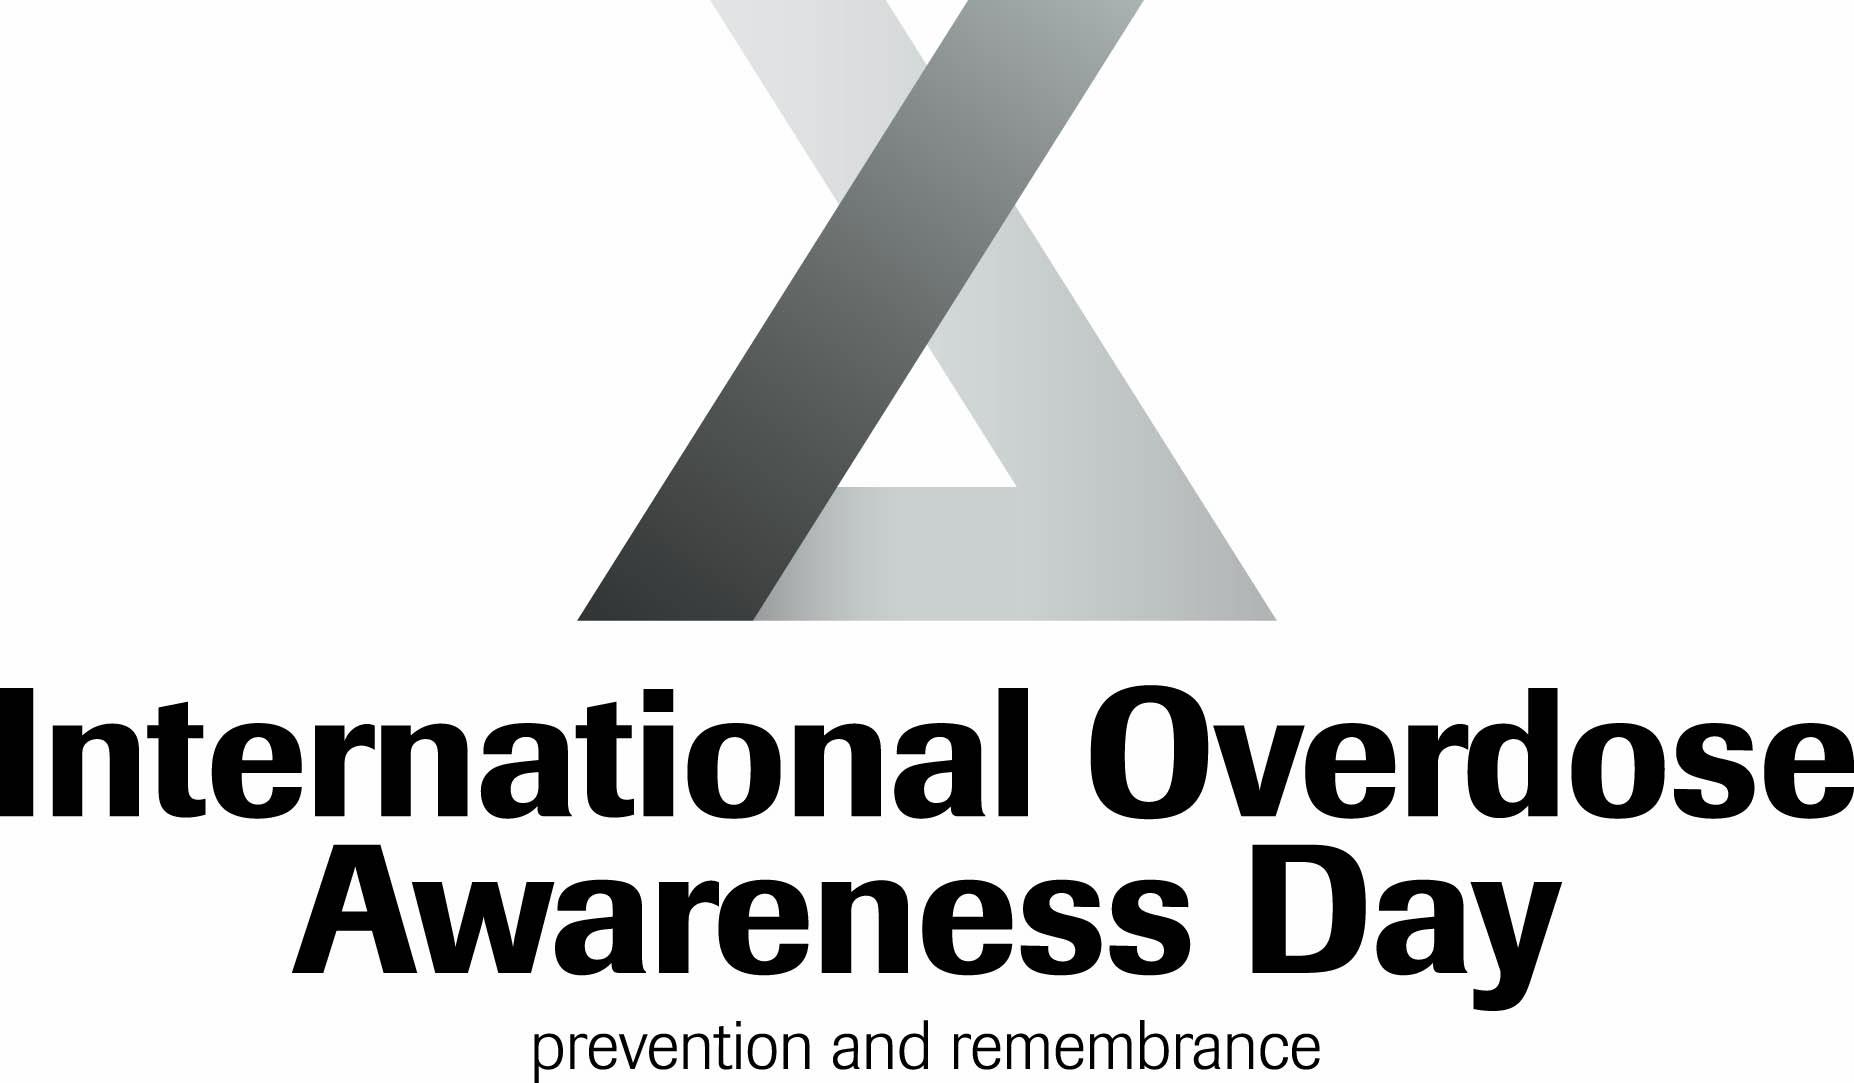 International Overdose Awareness Day Logo